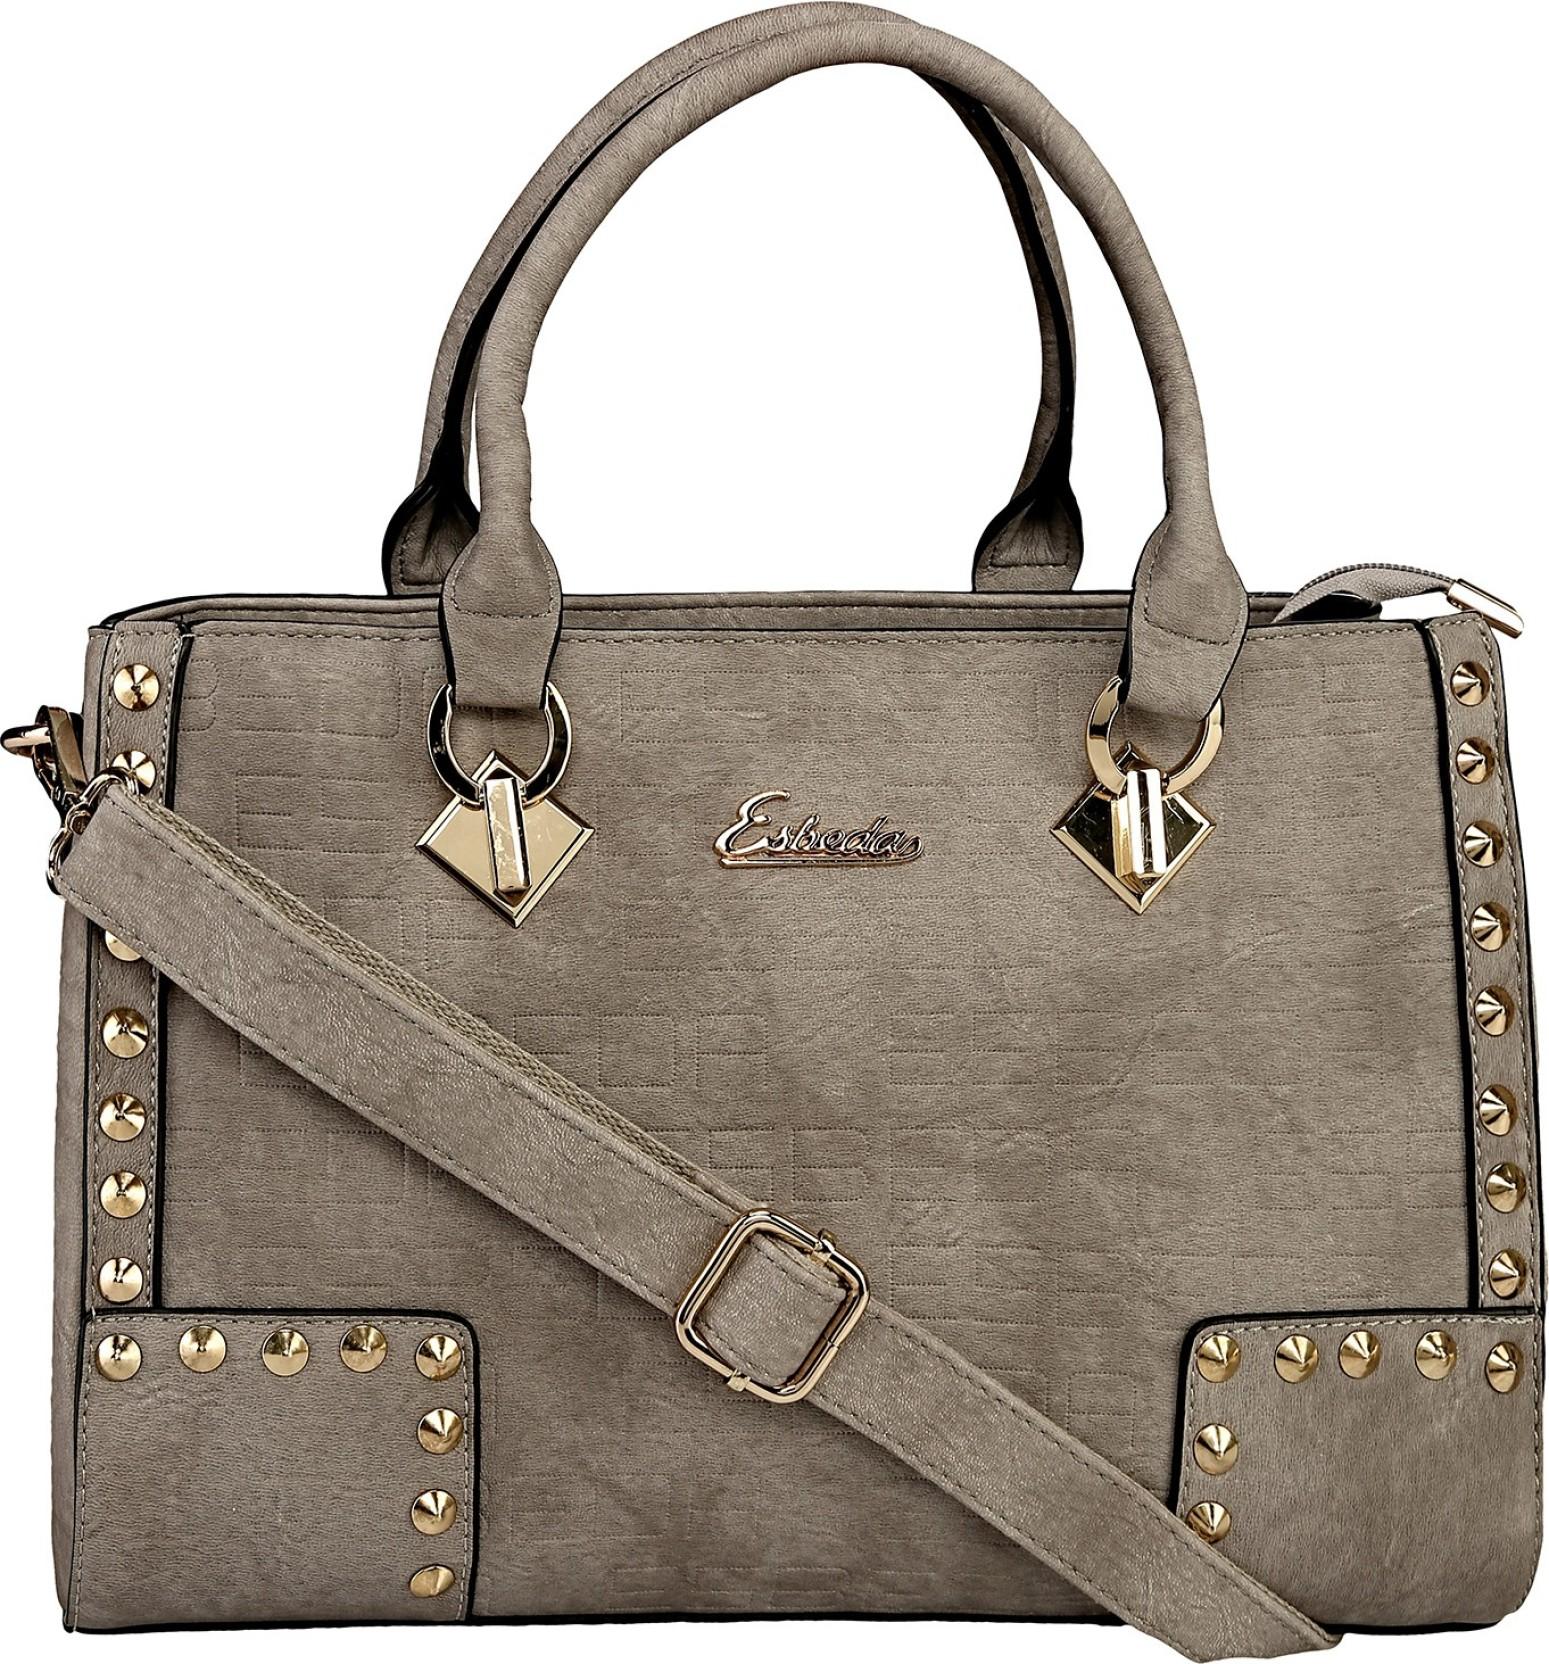 45518f43da8 Esbeda Handbags Online Shopping In India